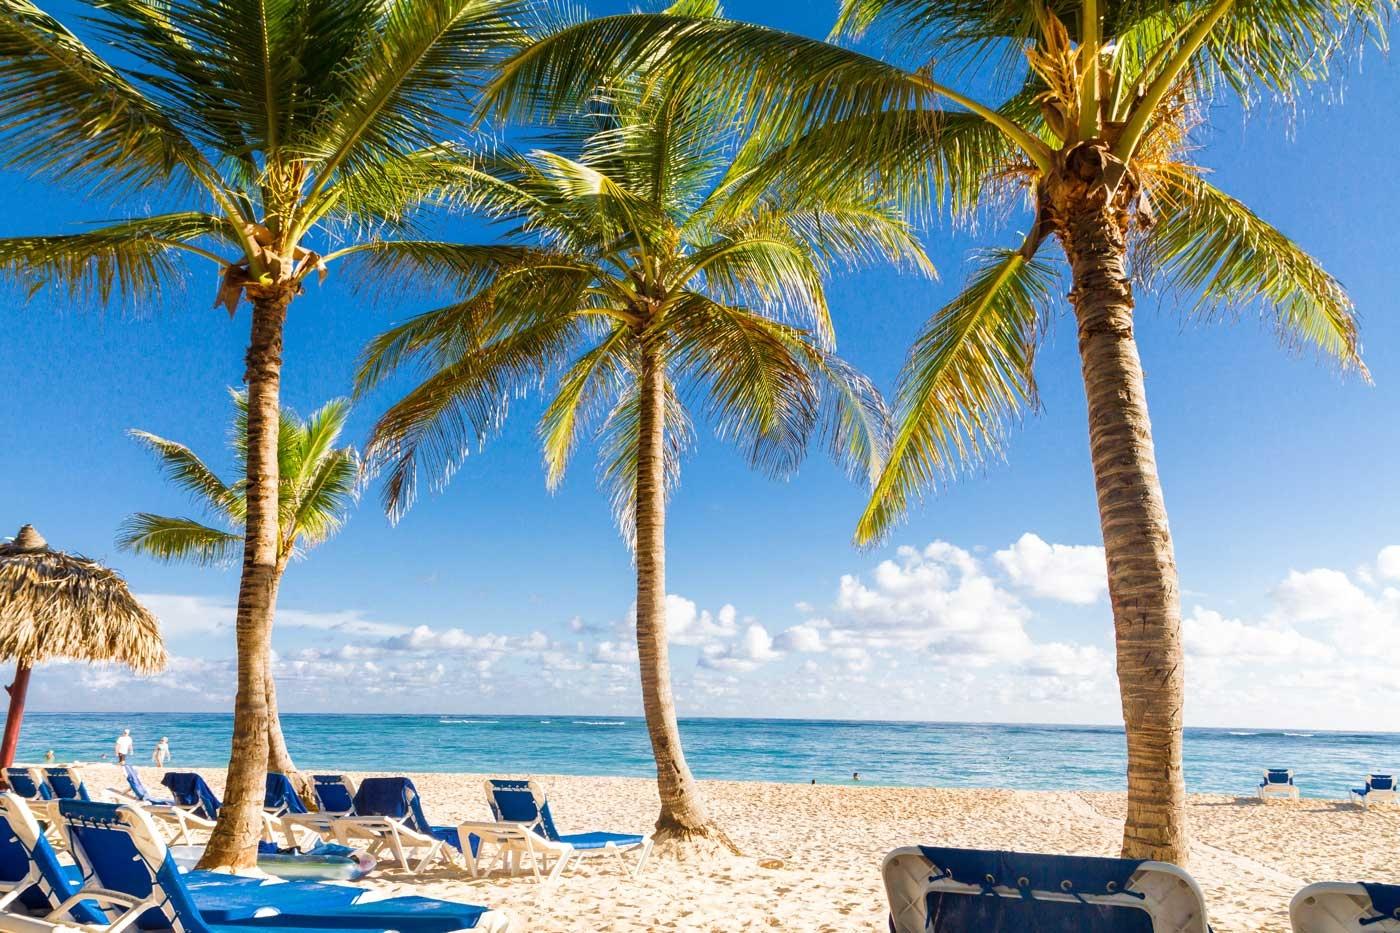 bavaro-punta-cana-beach-dominican-republic-destination